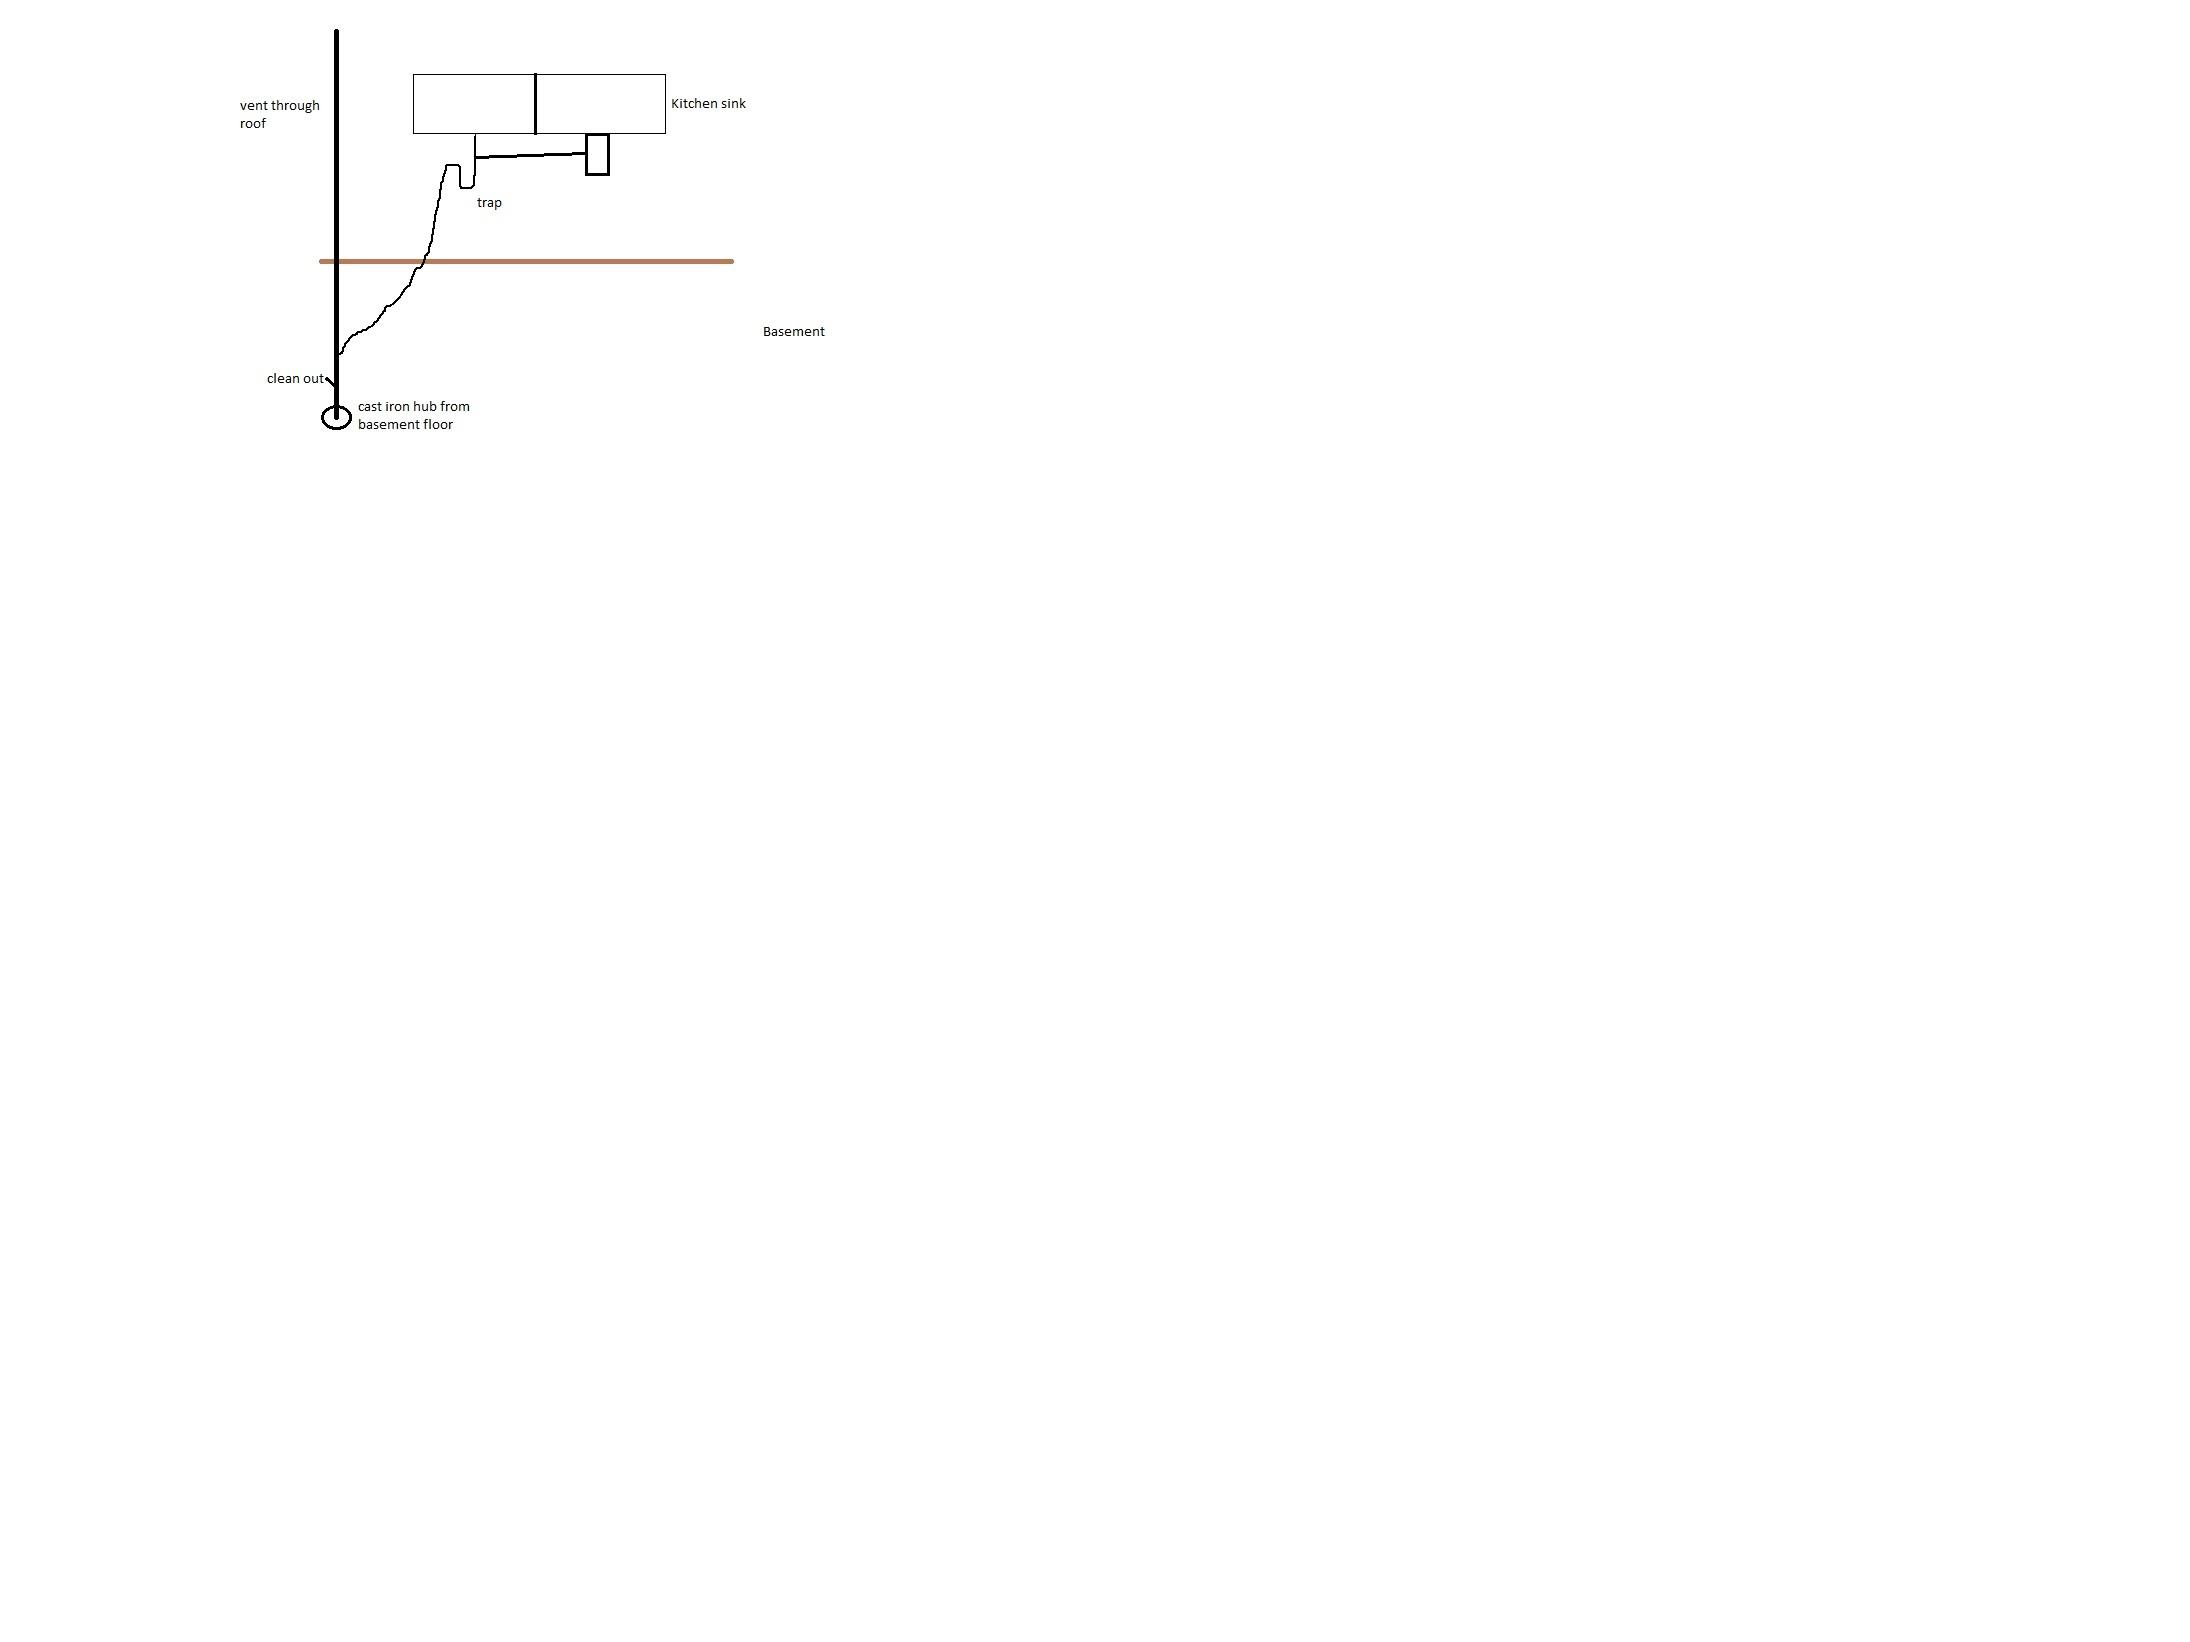 Kitchen plumbing set-up. Is this ok?-kitchen-sink-set-up.jpg